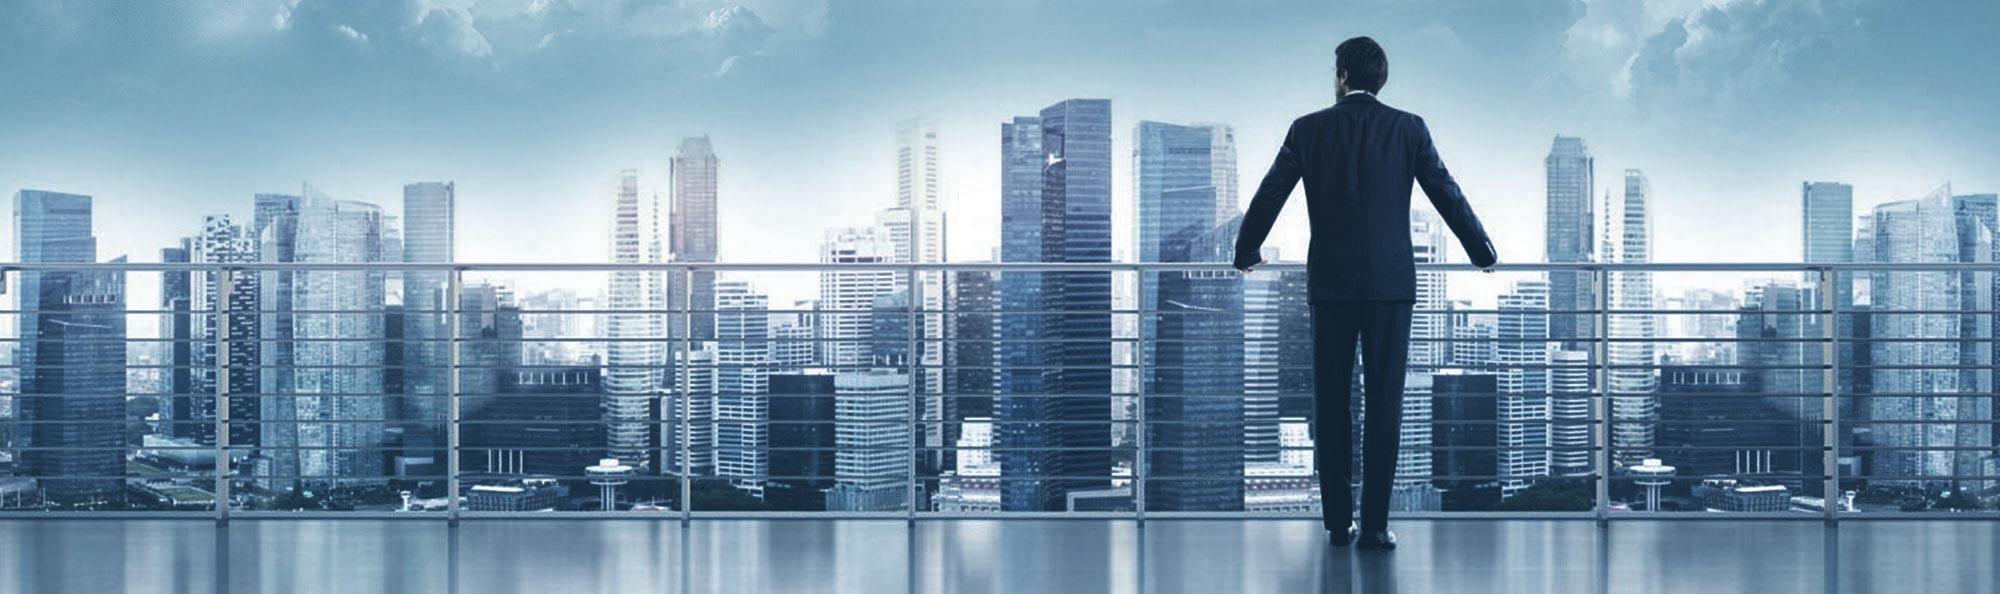 Real Estate - Euromanagement Ragusa